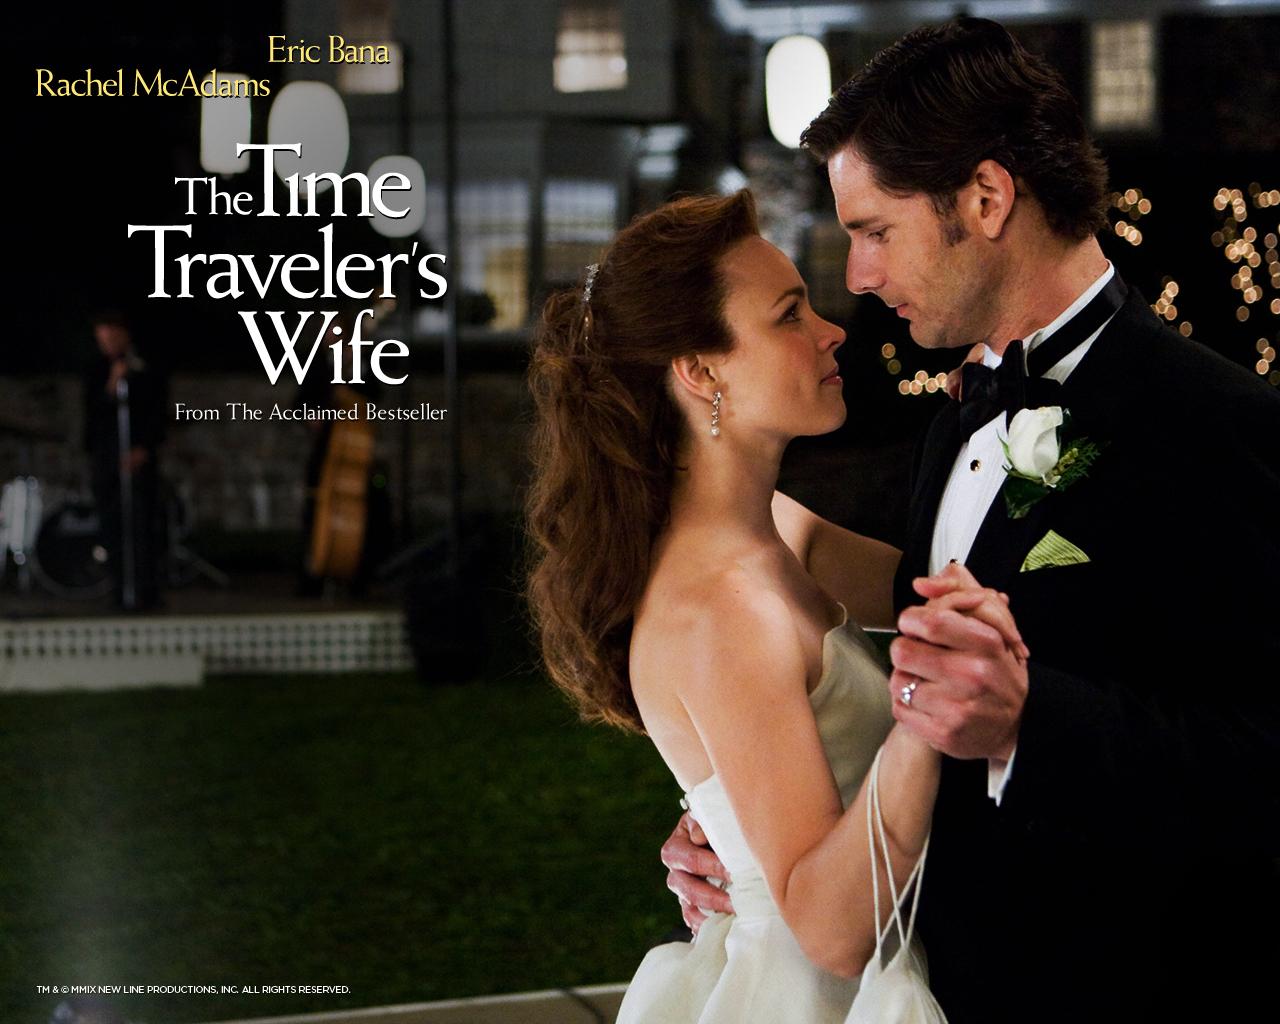 http://4.bp.blogspot.com/-a49Enq8Dv3I/TWPeKBXeHyI/AAAAAAAAAhY/xJjla-sarx4/s1600/Eric_Bana_in_The_Time_Travelers_Wife_Wallpaper_3_1280.jpg